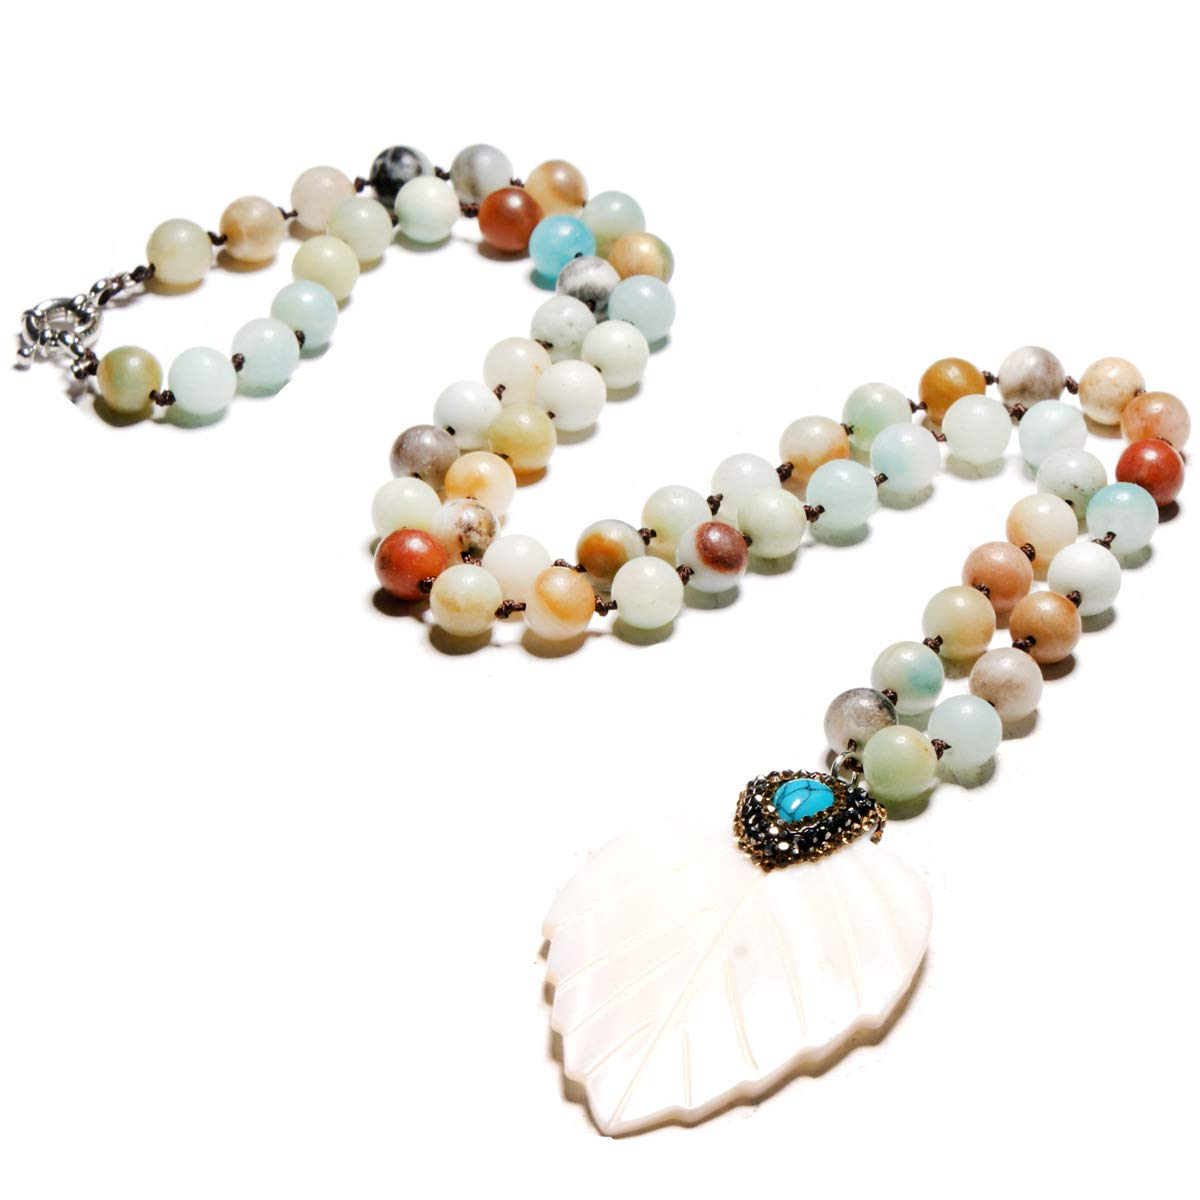 SEVENSTONE 8mm Natural Matte Amazonite Beads Necklace Women Men Handmade Long Necklace For Prayer Meditation Yoga